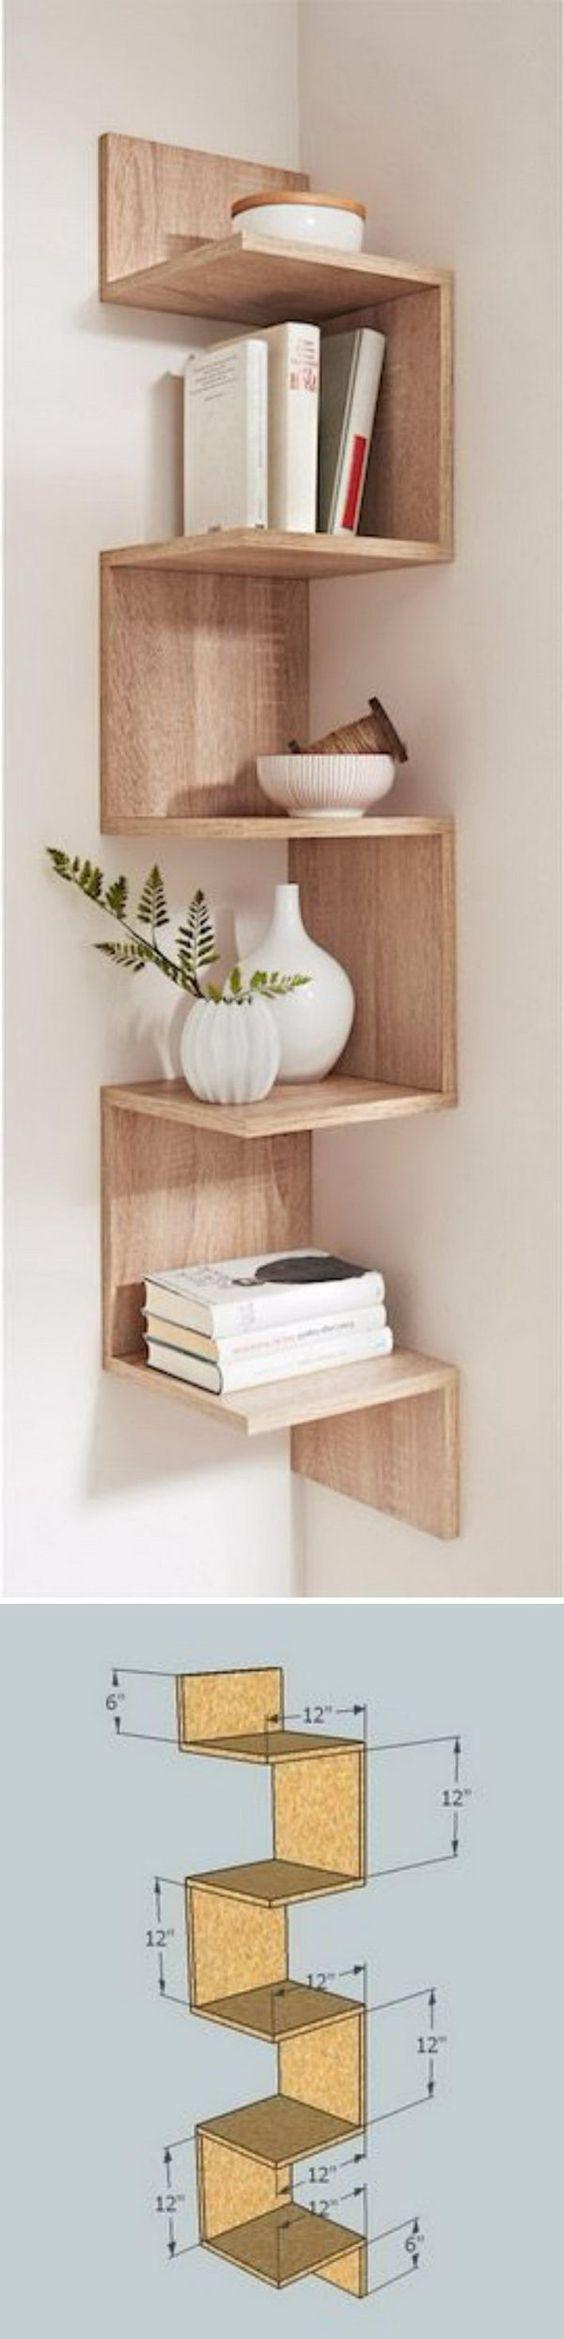 20+ diy corner shelves to beautify your awkward corner | corner